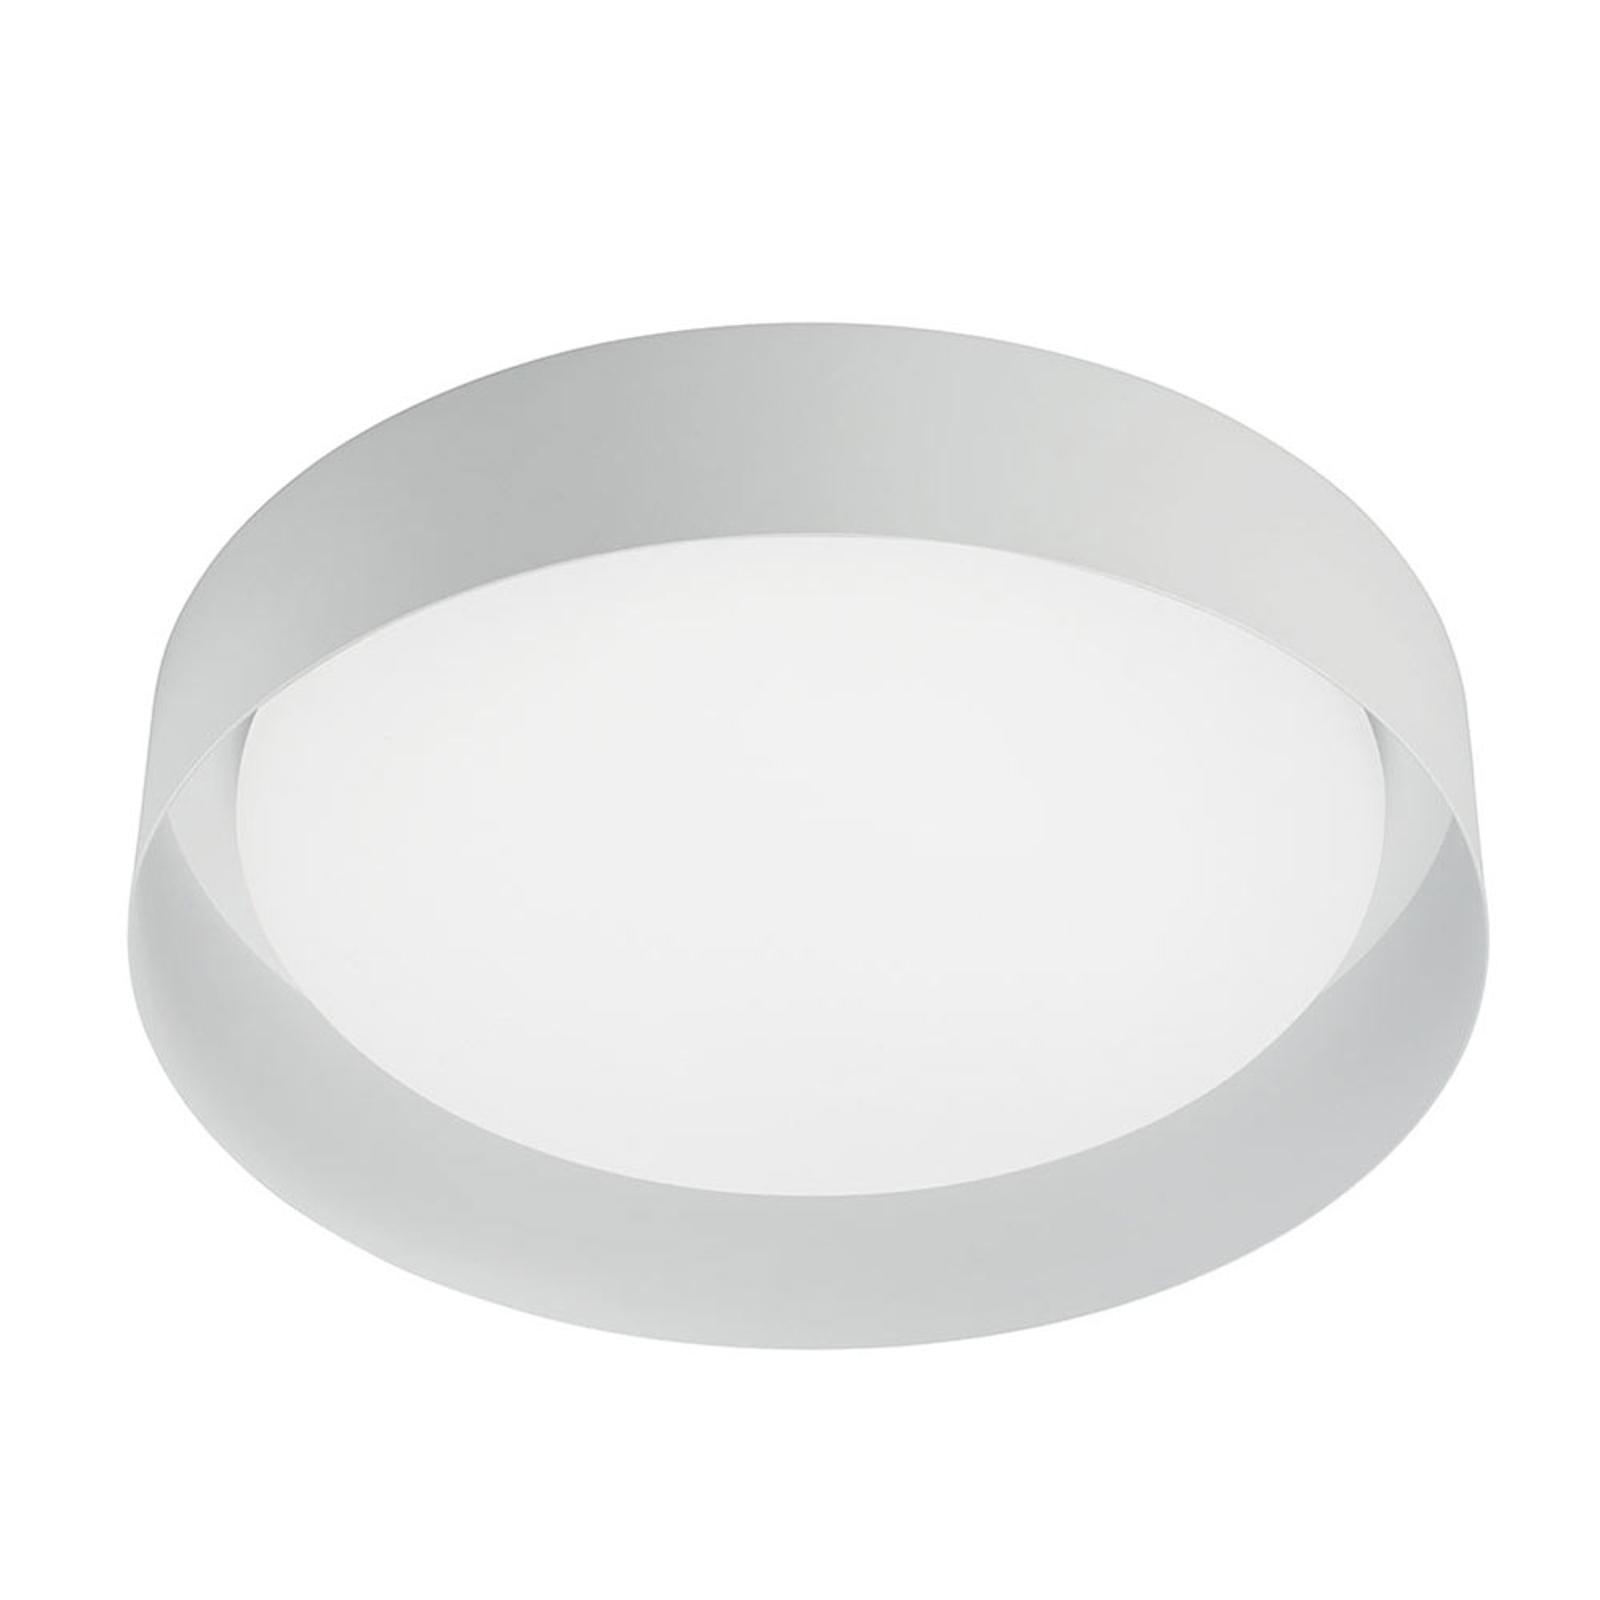 Plafonnier LED Crew 2, Ø 26cm, blanc